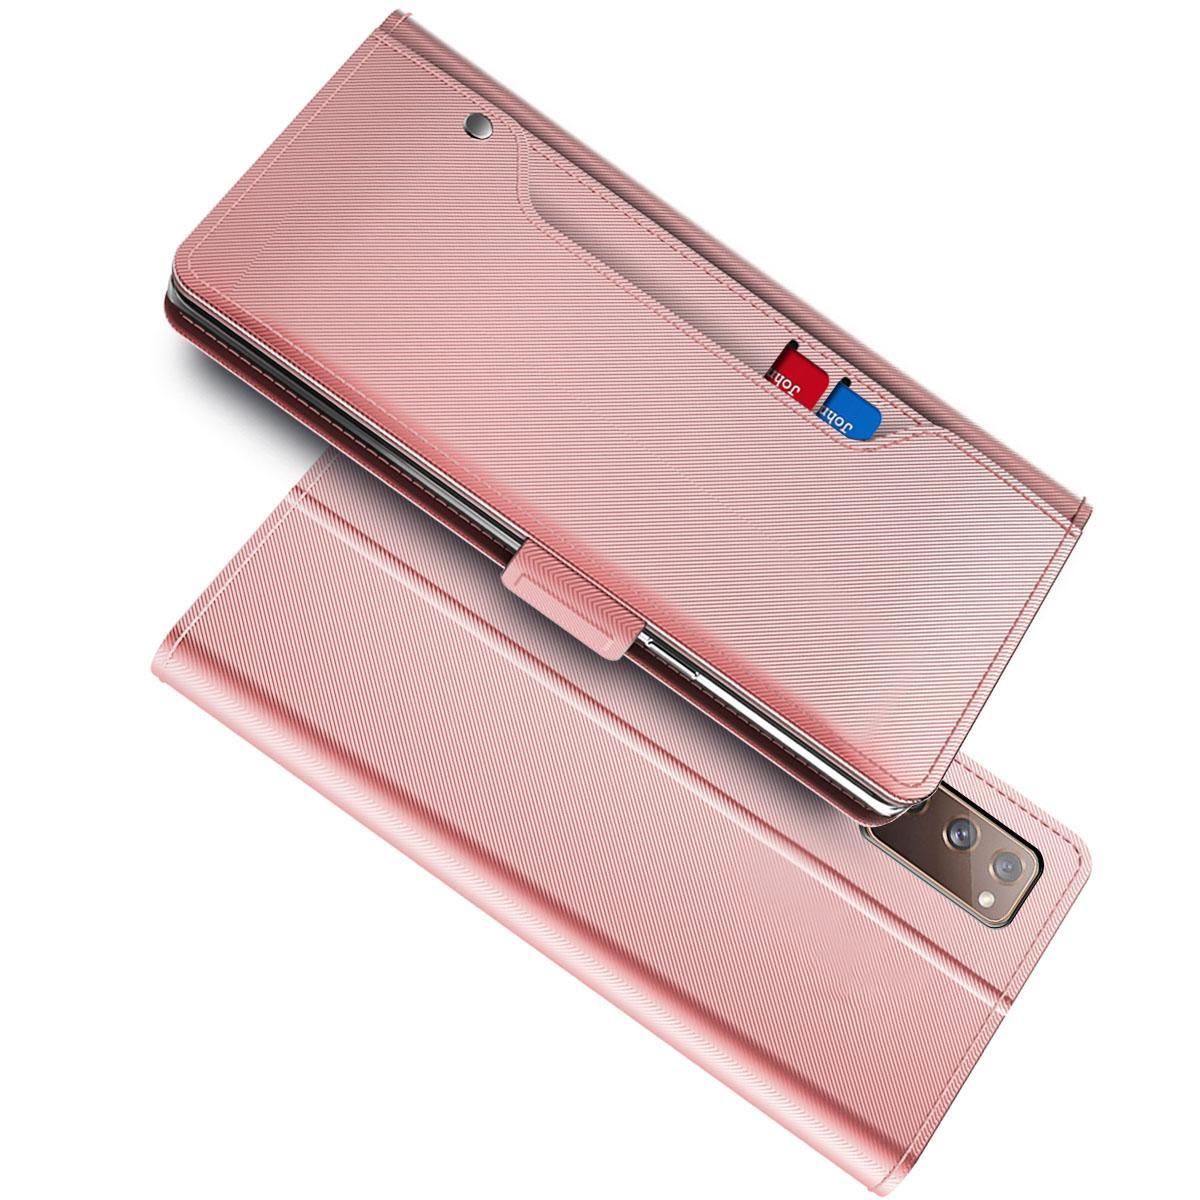 Plånboksfodral Spegel Galaxy A52 5G rosa guld